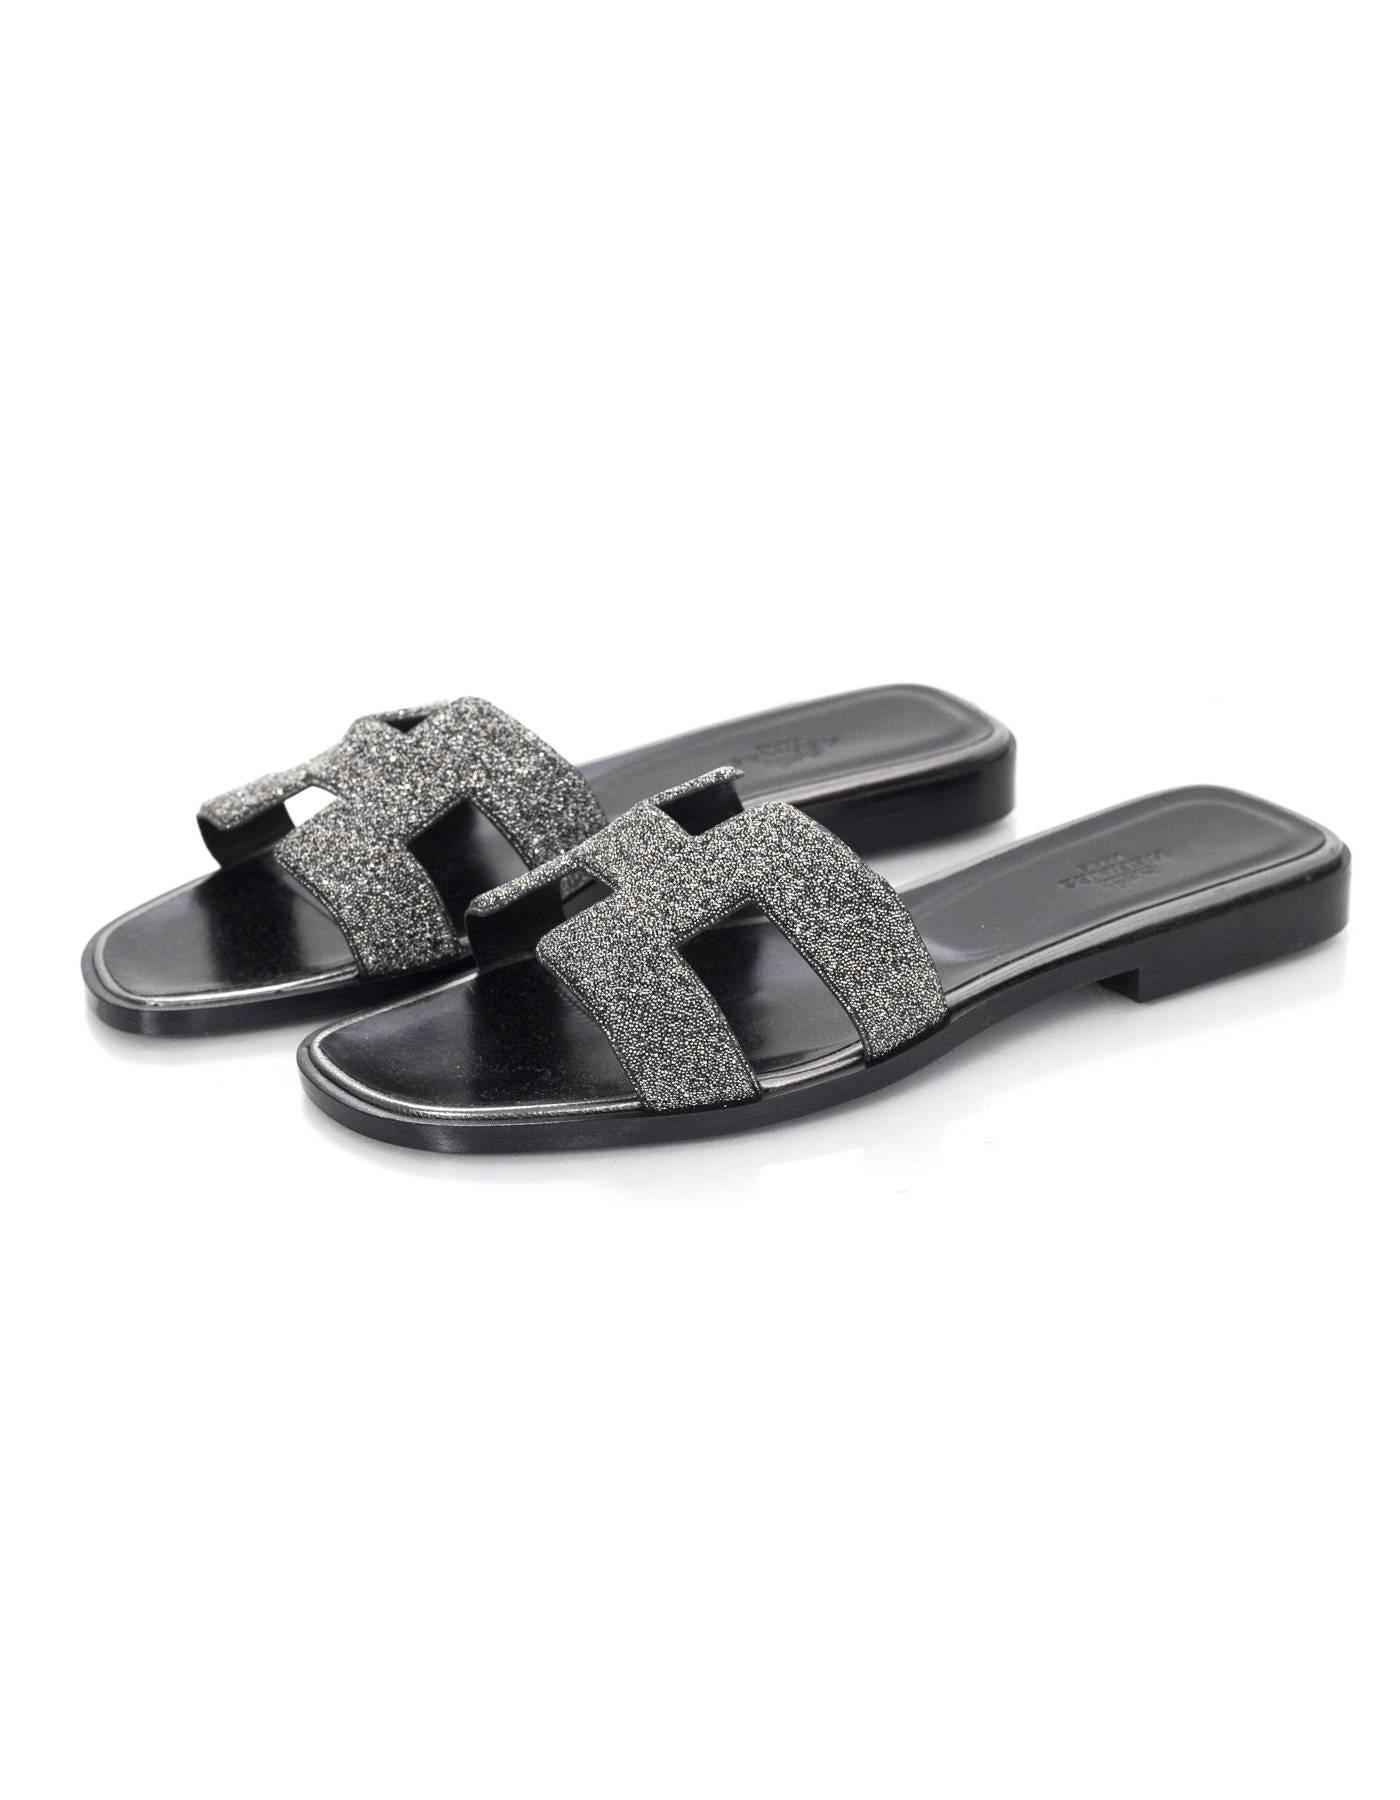 a52f0f500cba Hermes Black and Grey Crystal Powder Oran H Sandals Sz 37.5 rt ...